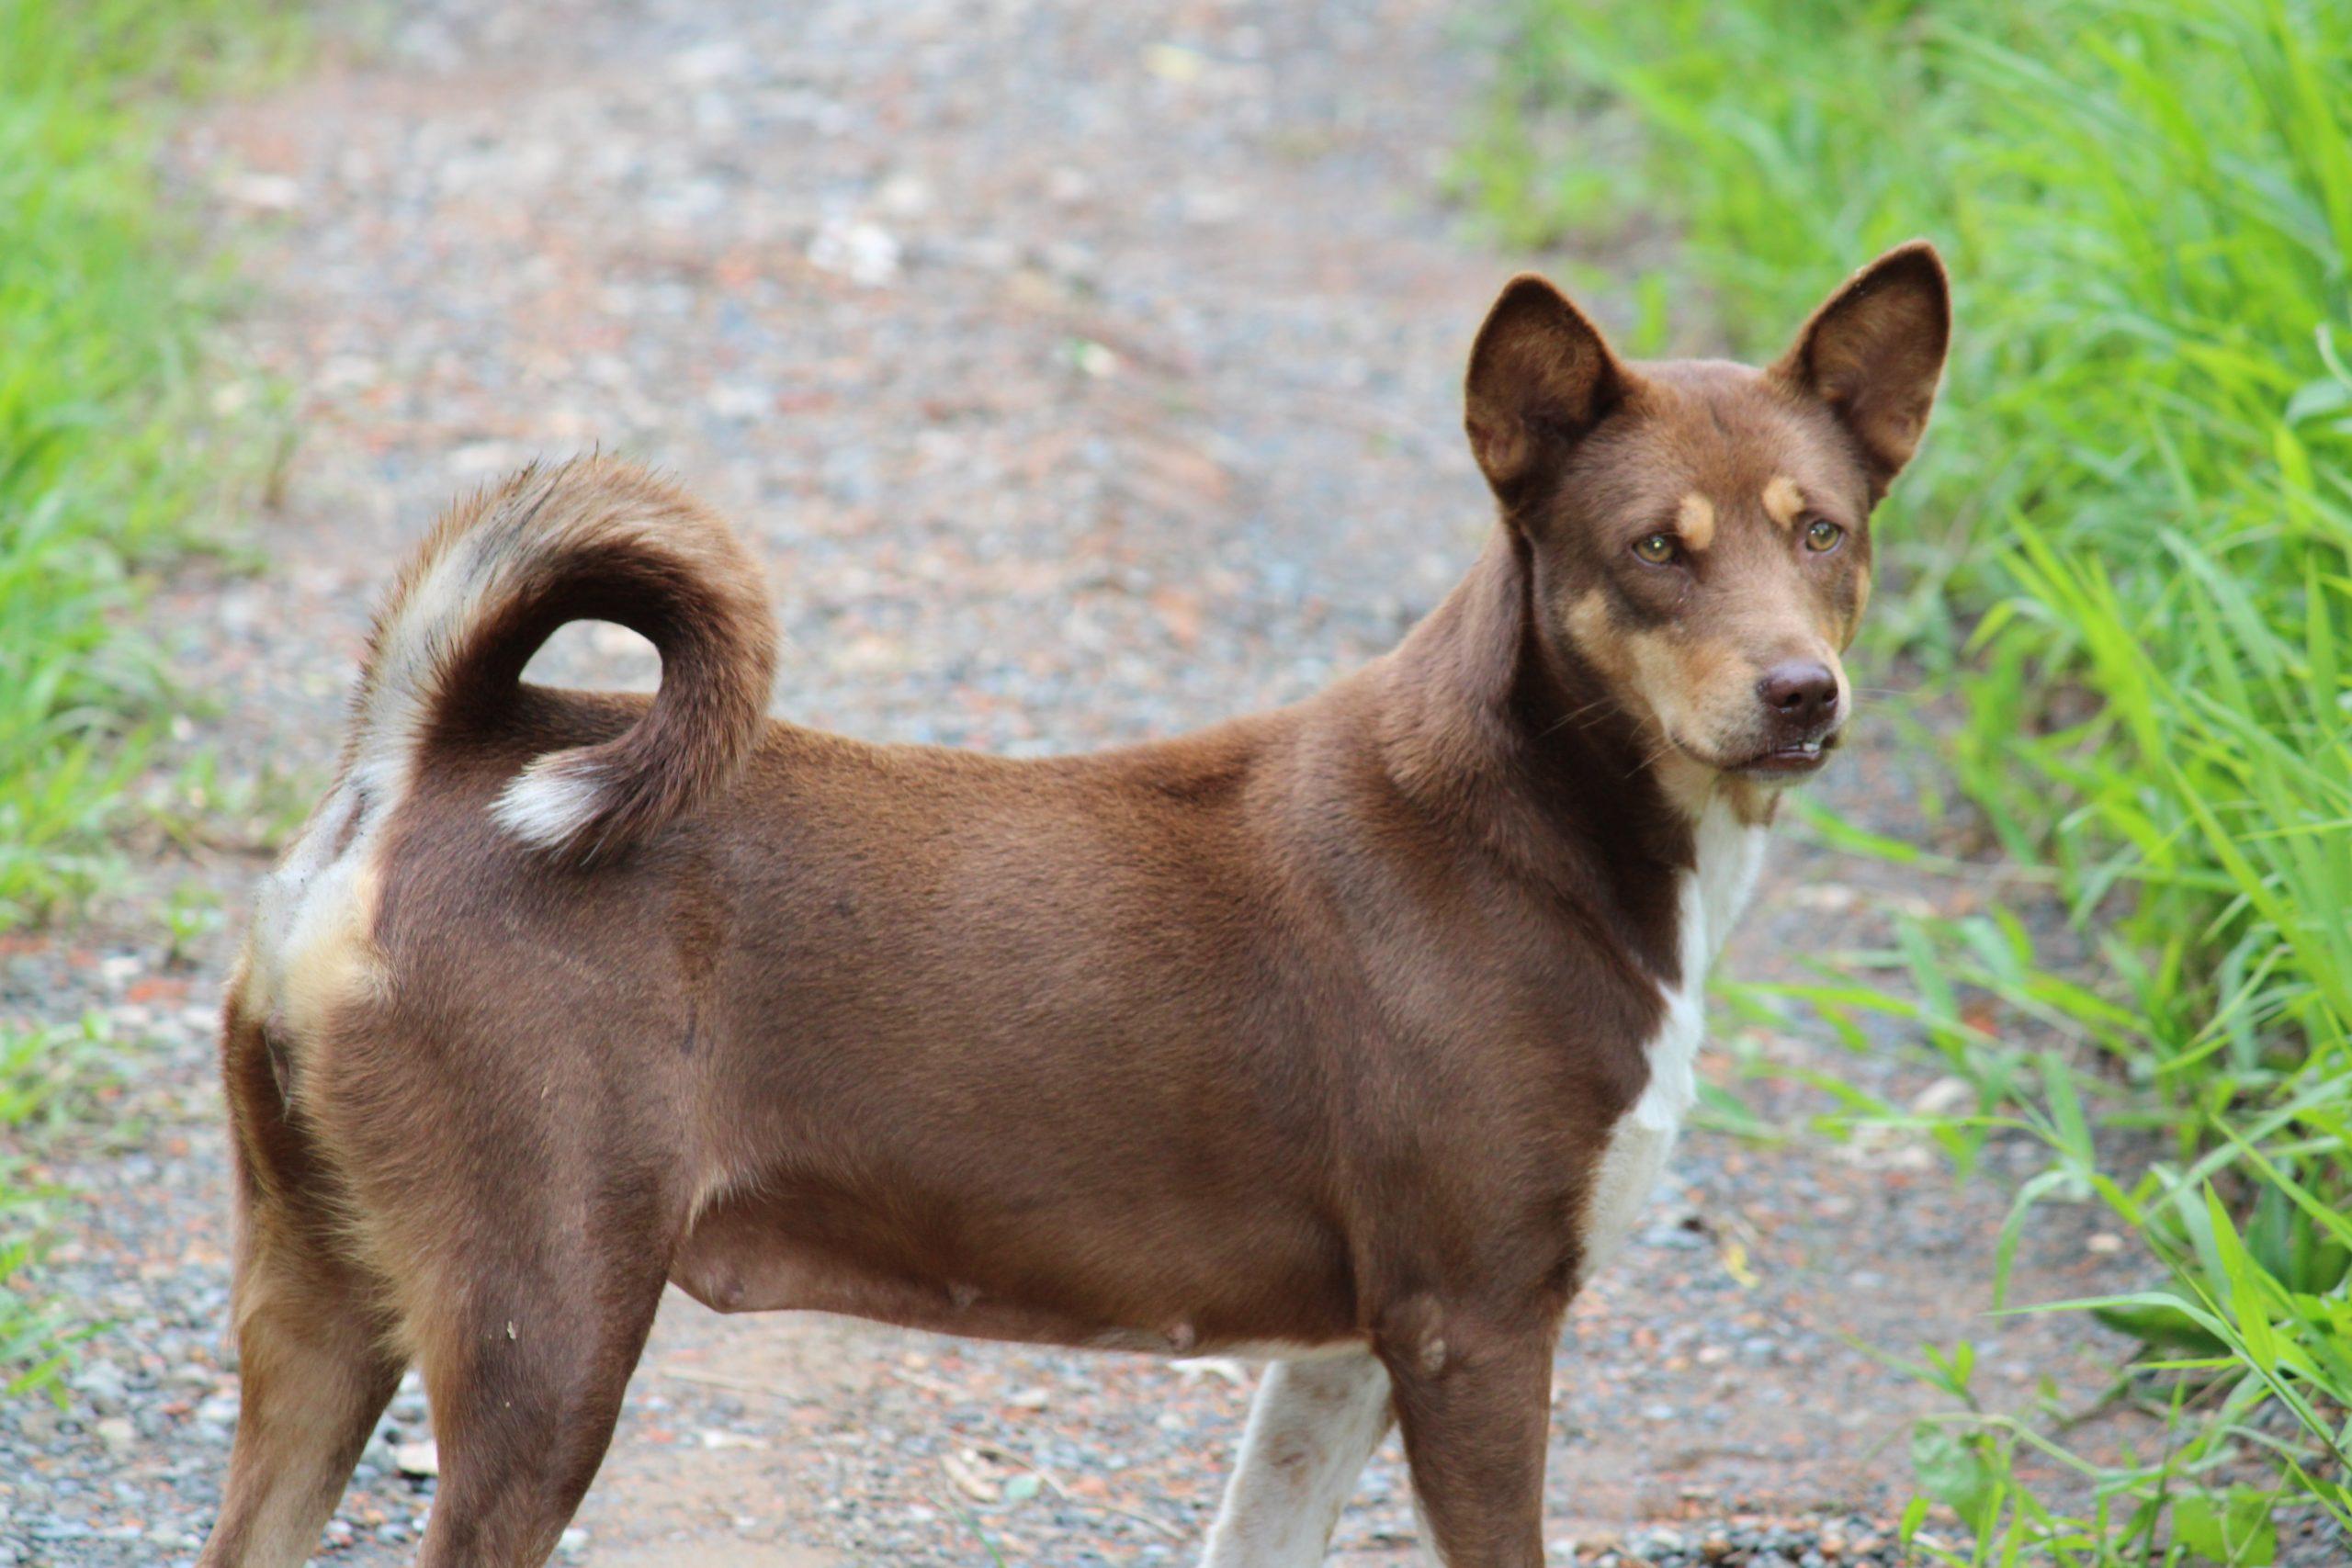 A brown dog